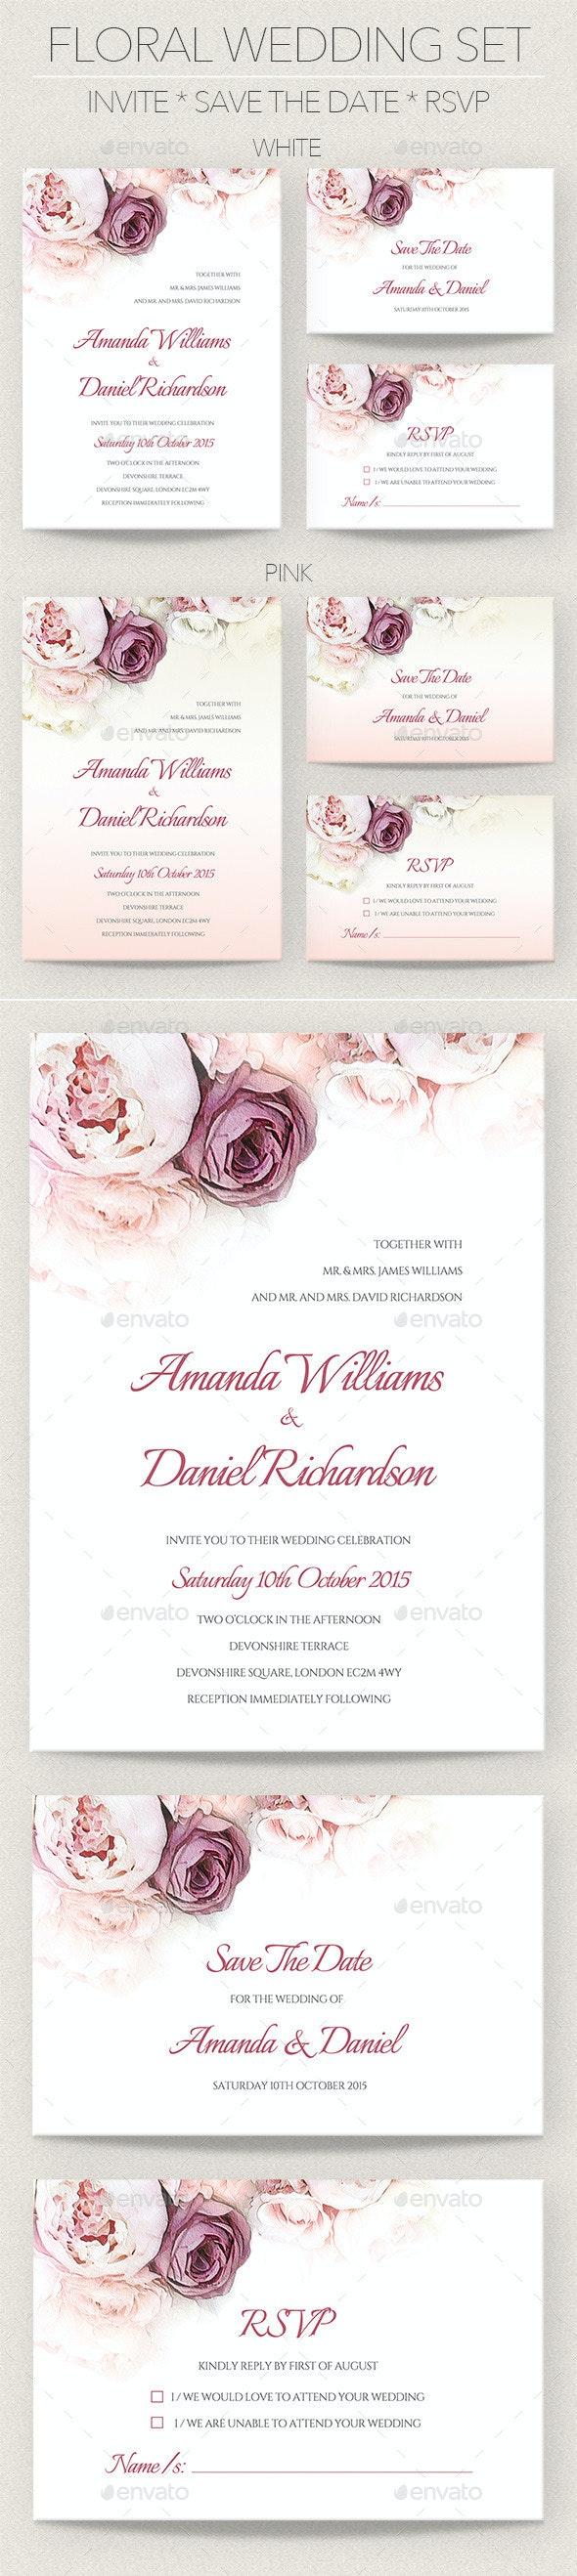 Floral Wedding Invitation Set - Weddings Cards & Invites